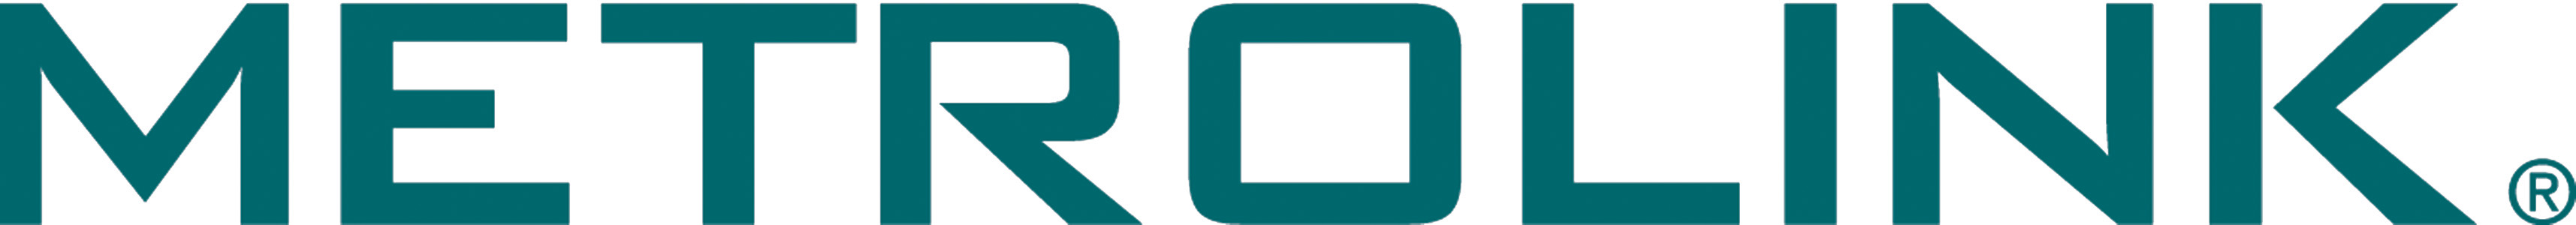 Metrolink Logo with Train